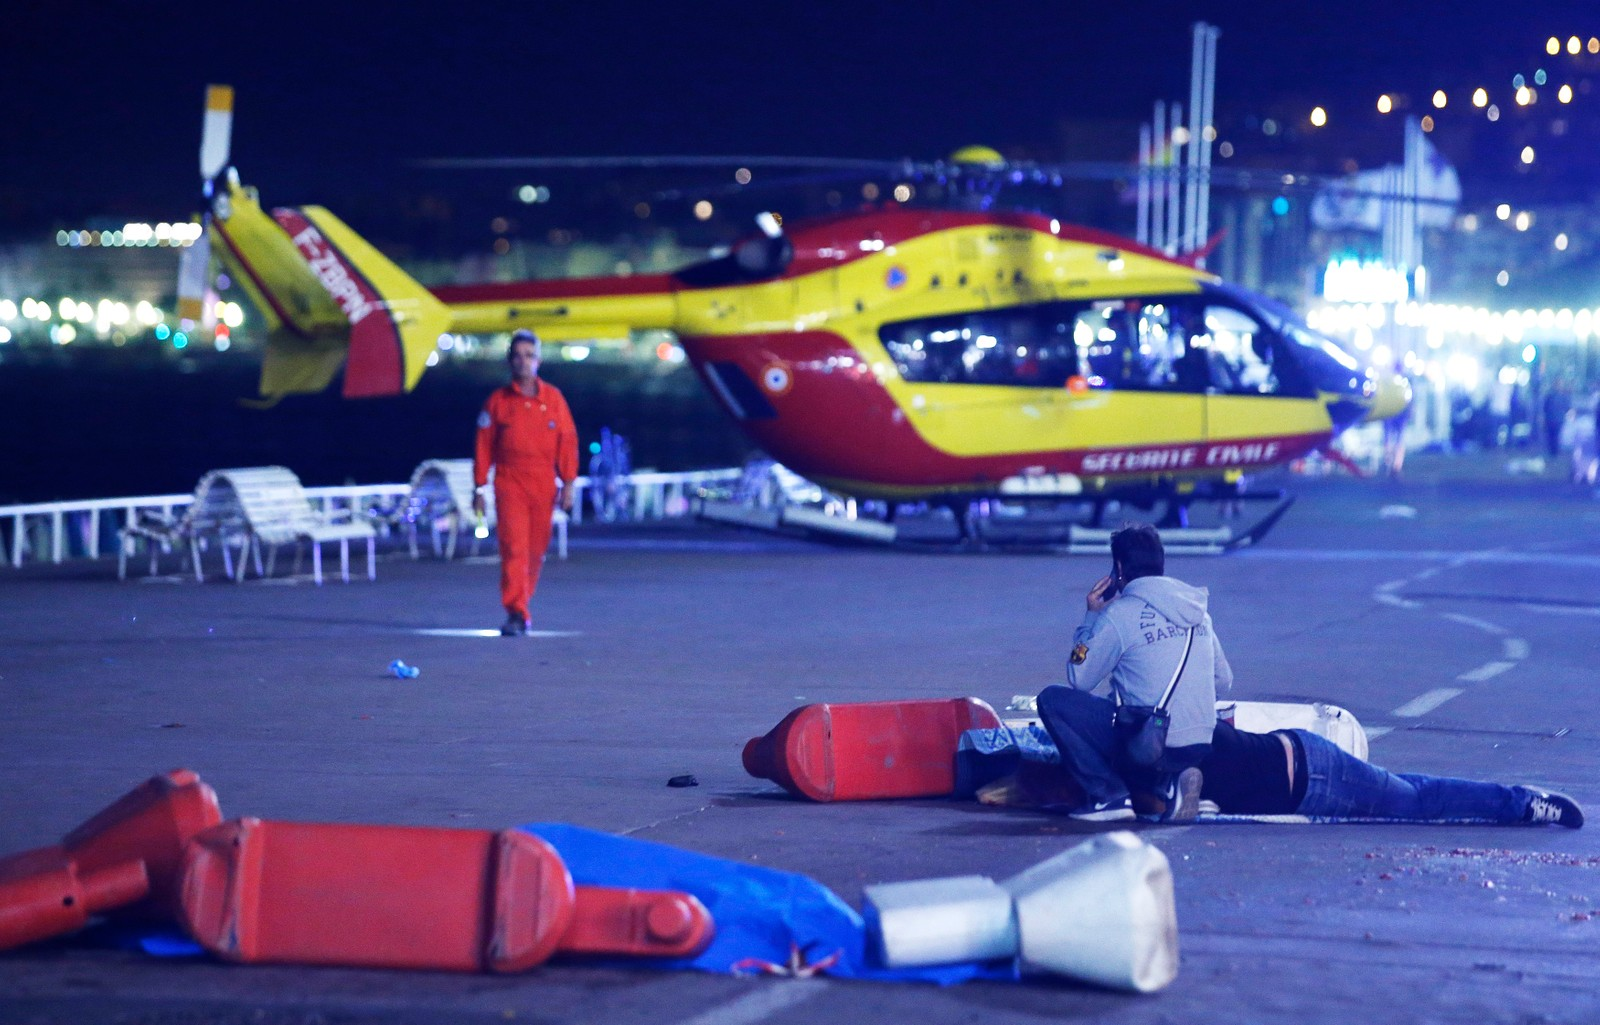 Terrorangrep i Nice 14. juli 2016: En skadet person ligger foran et helikopter på strandpromenaden i Nice.